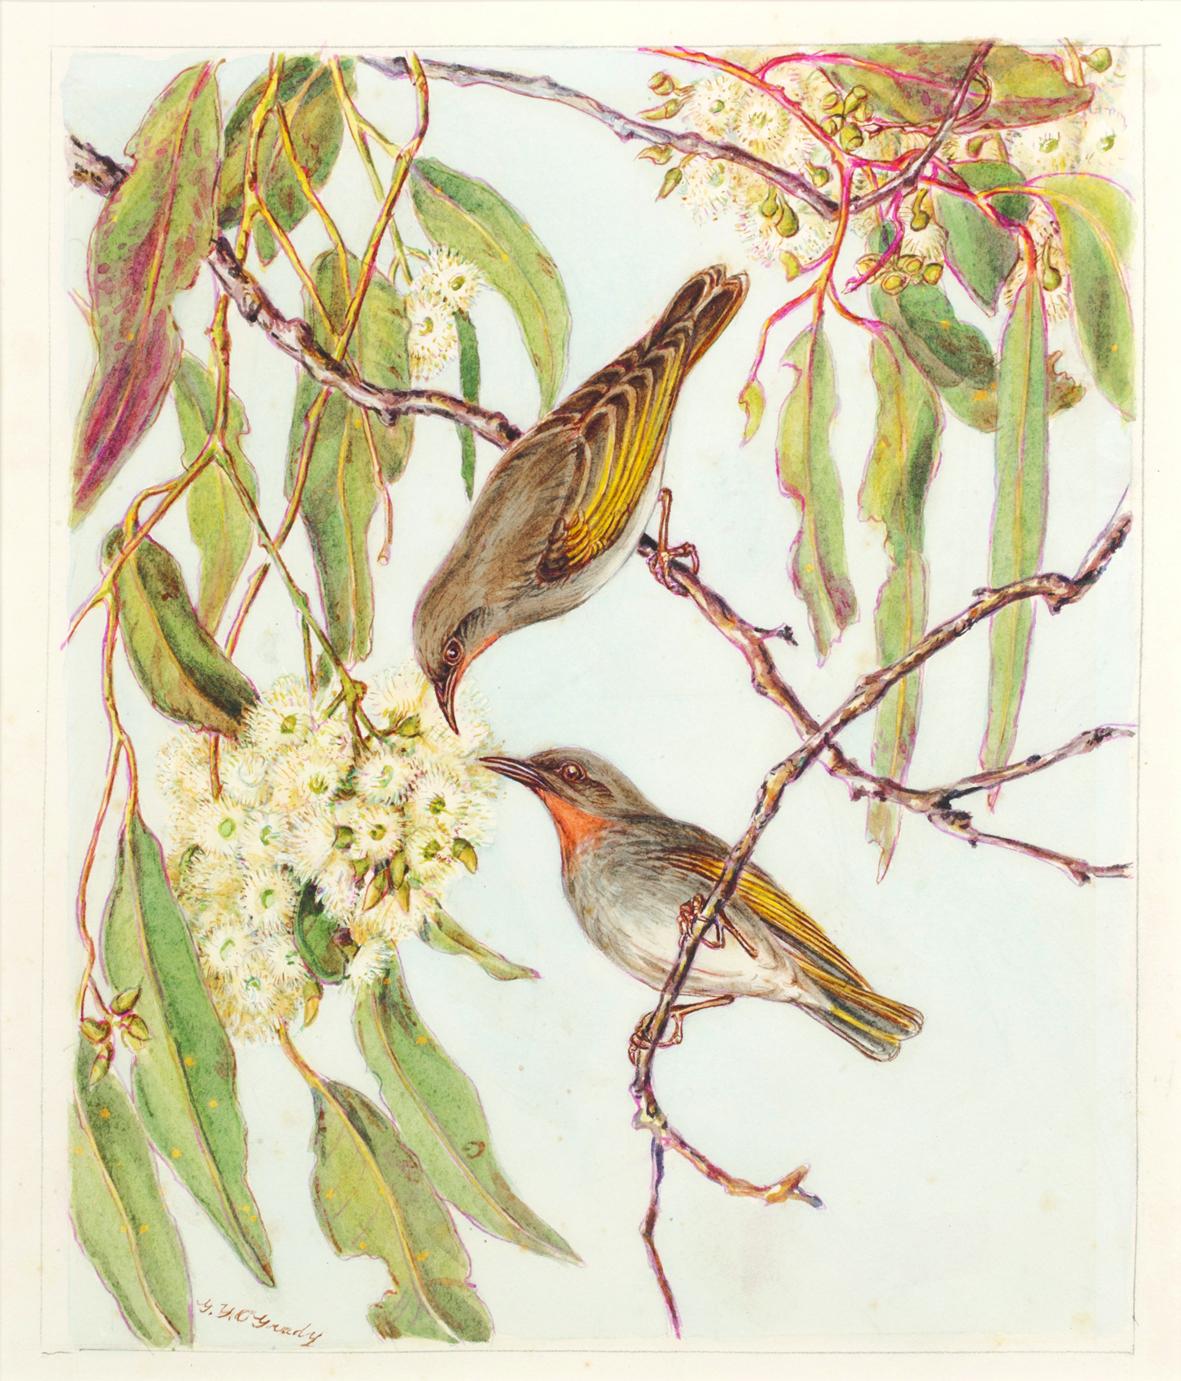 Gladys O'GRADY (1894 – 1985), Rufous Fantail, Watercolour on paper, 27 x 40cm, Gift of Doris O'Grady 1988, O'Grady Collection